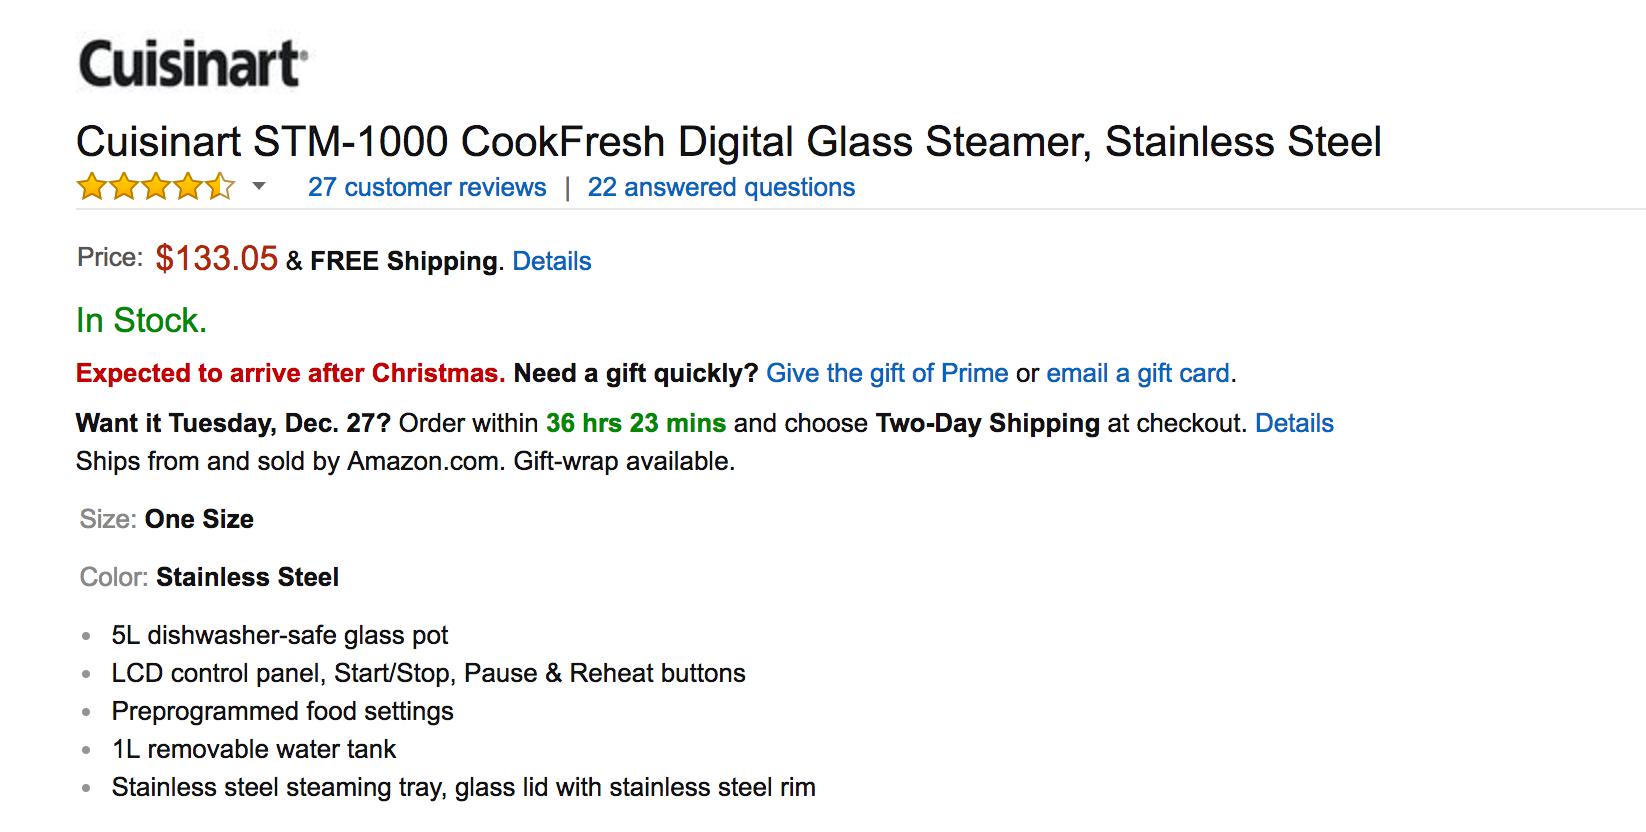 stainless-steel-cuisinart-cookfresh-digital-glass-steamer-4